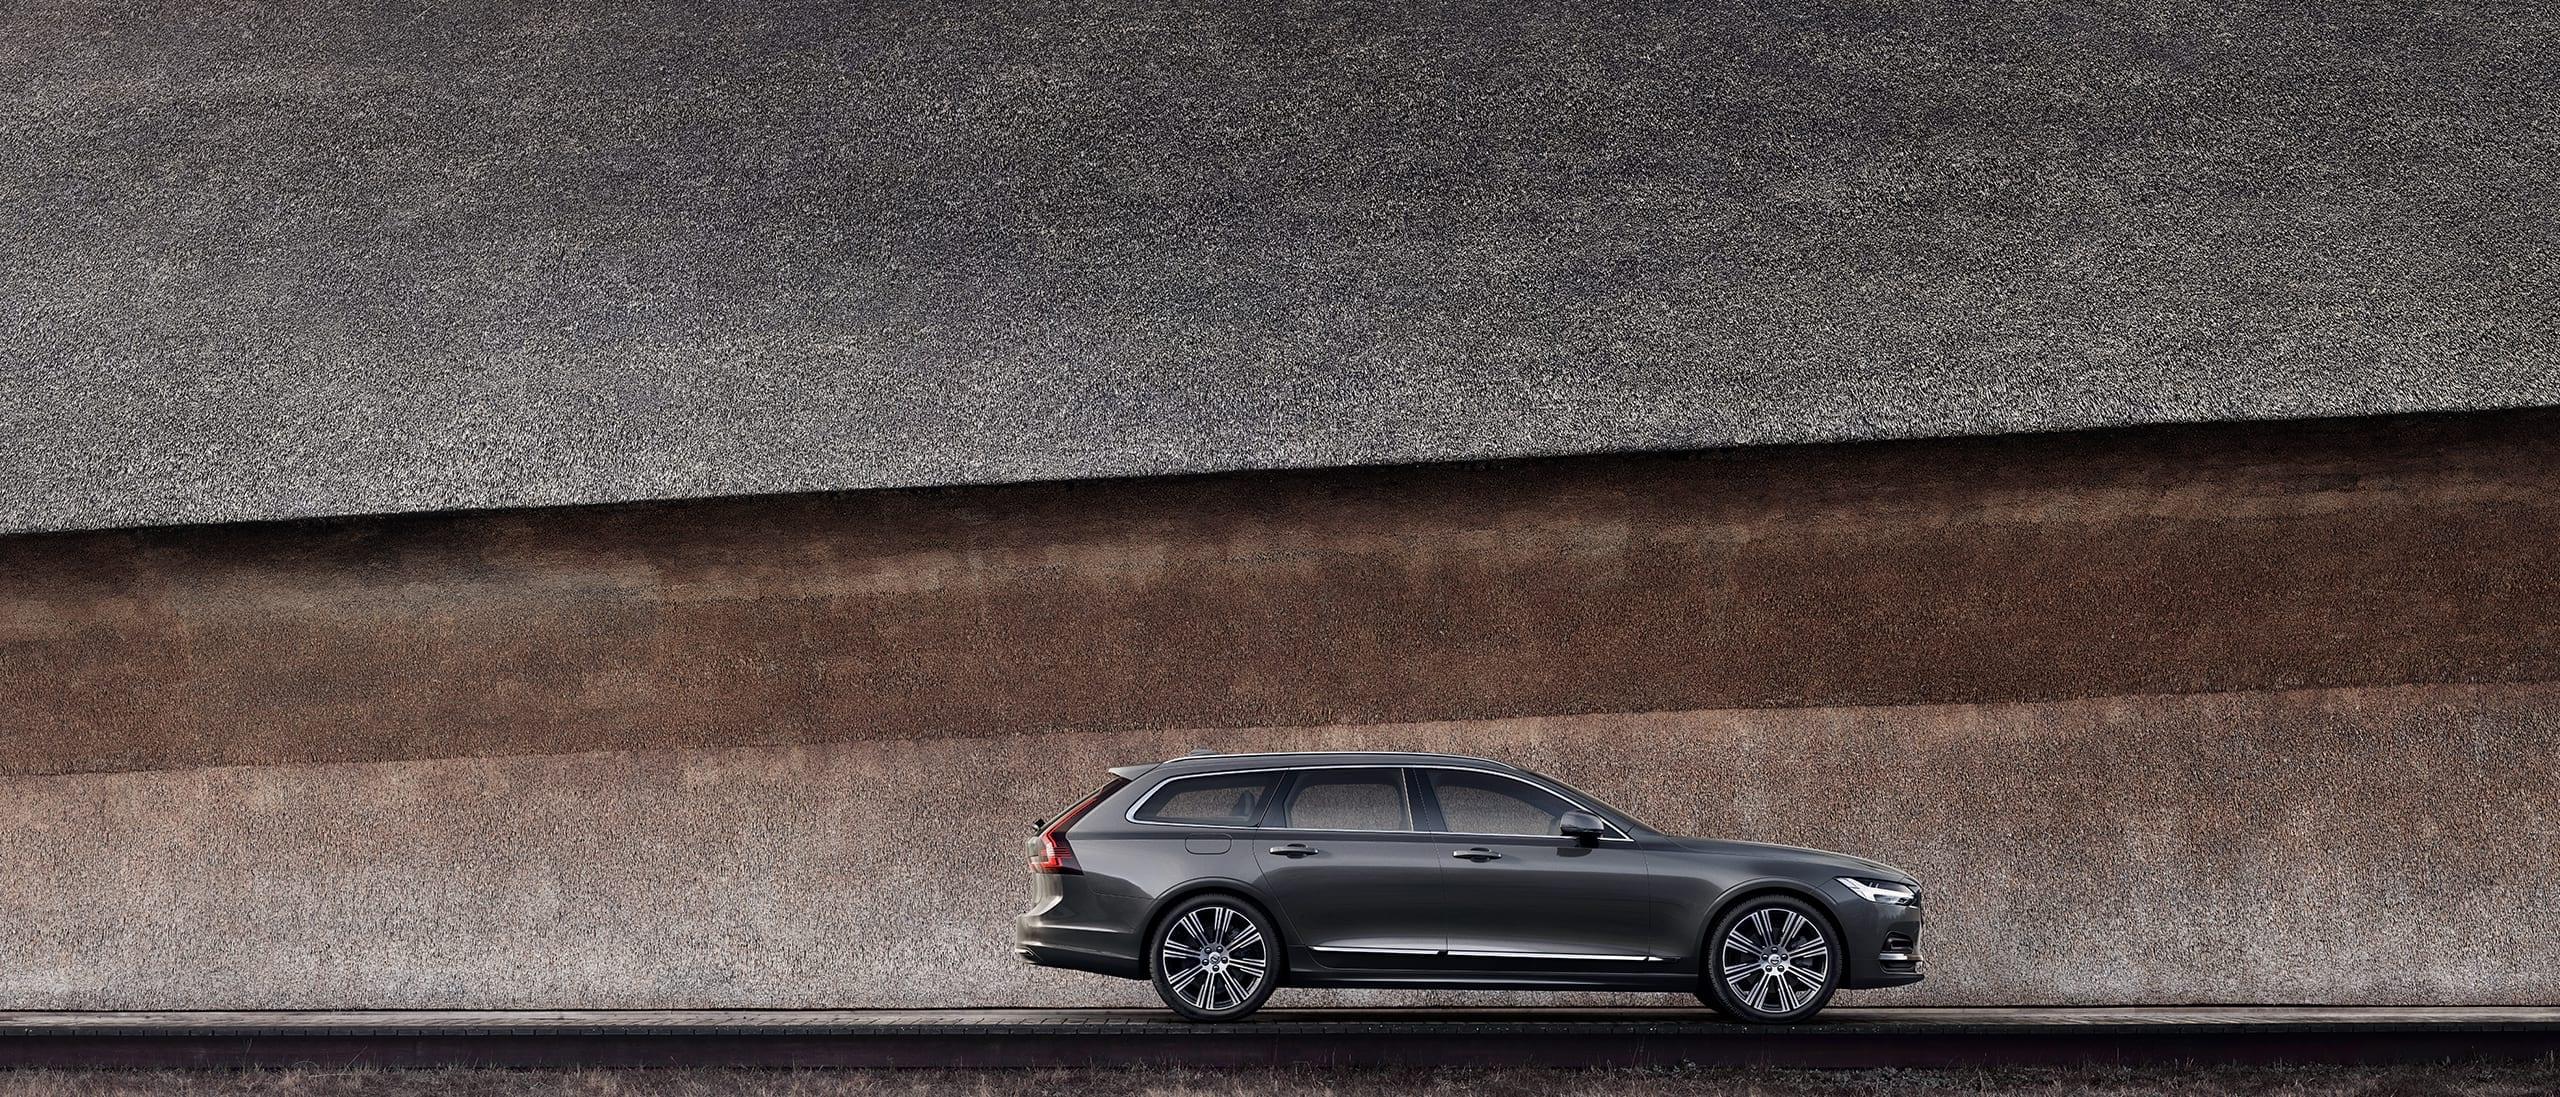 A dark grey Volvo V90 parked against a wall.